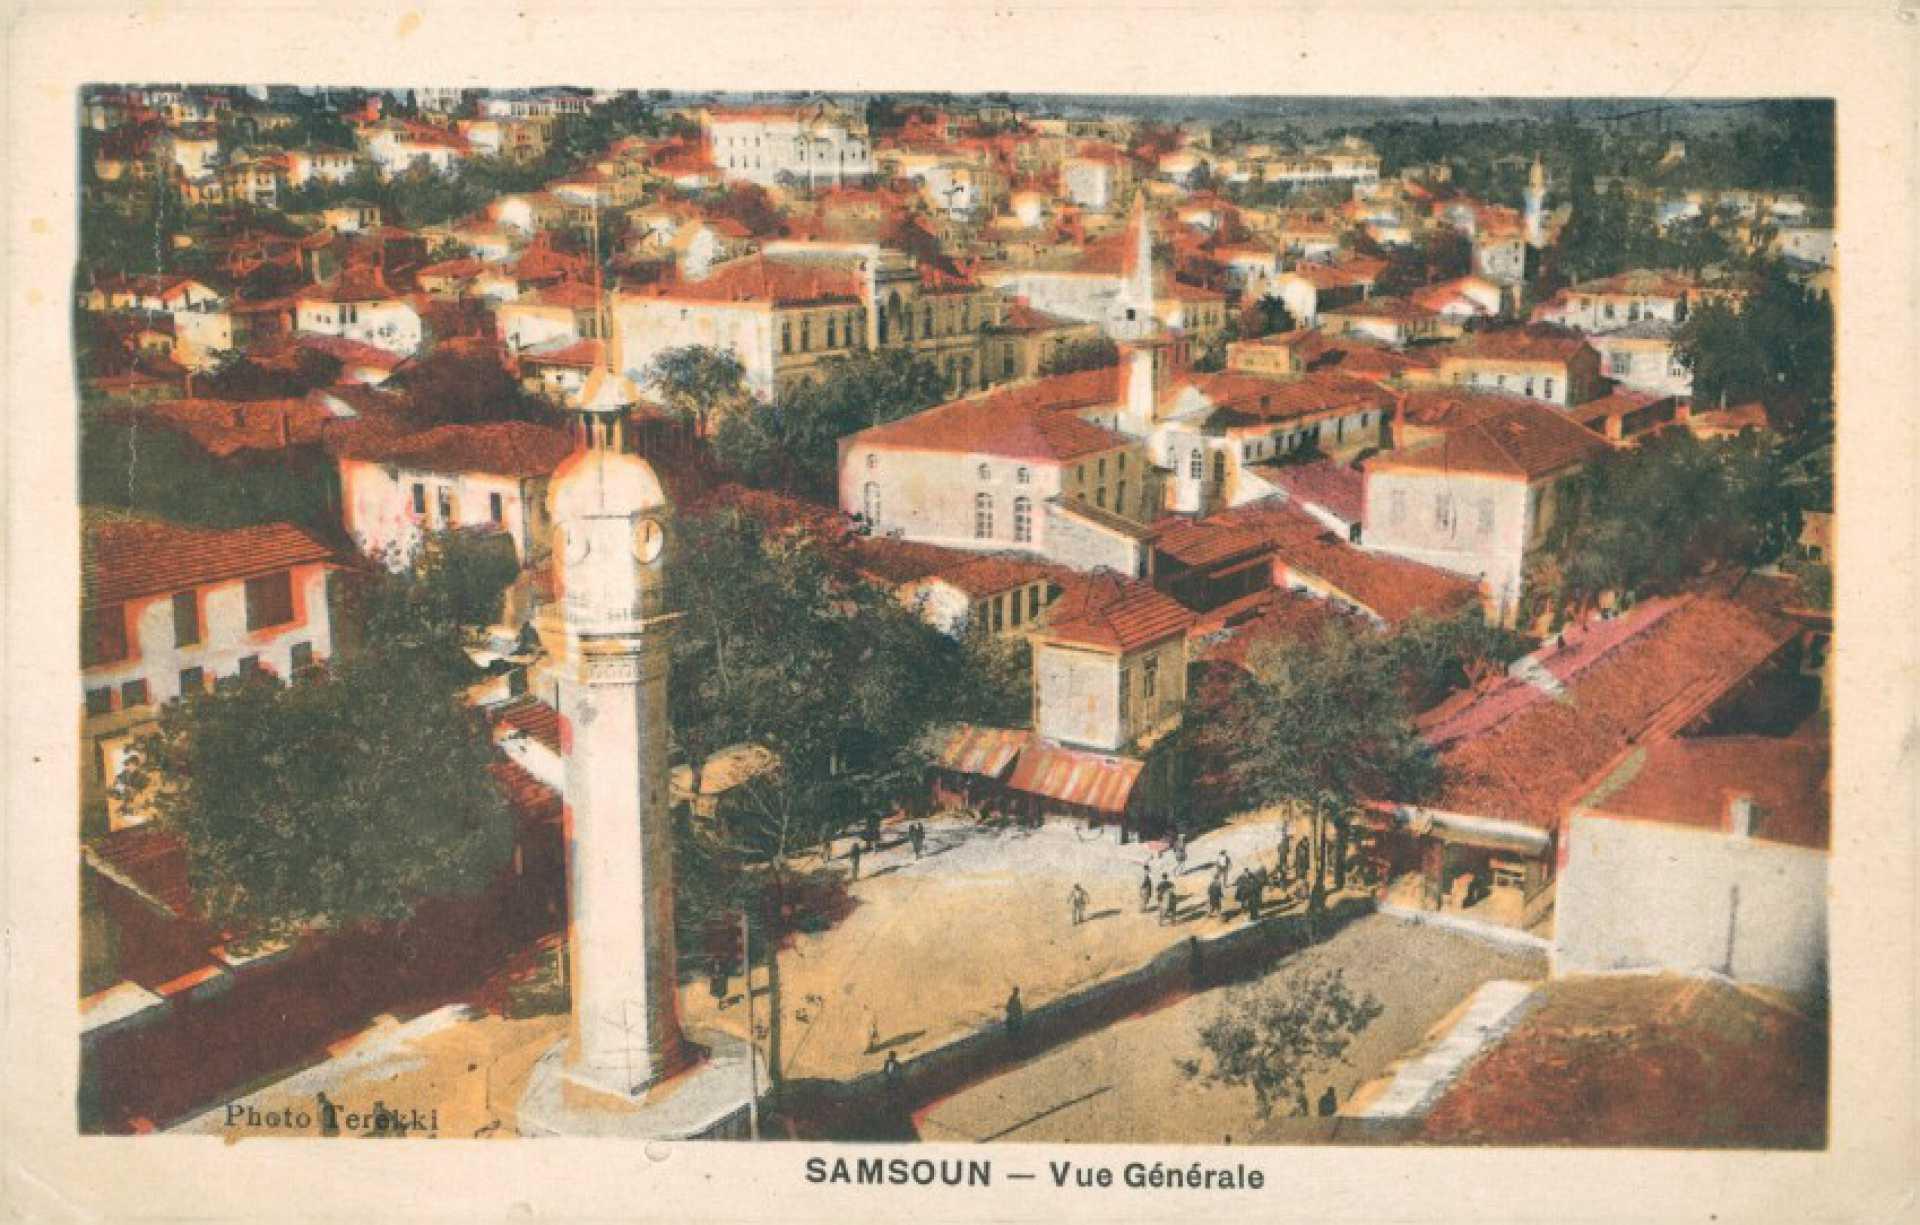 Samsoun – vue generale